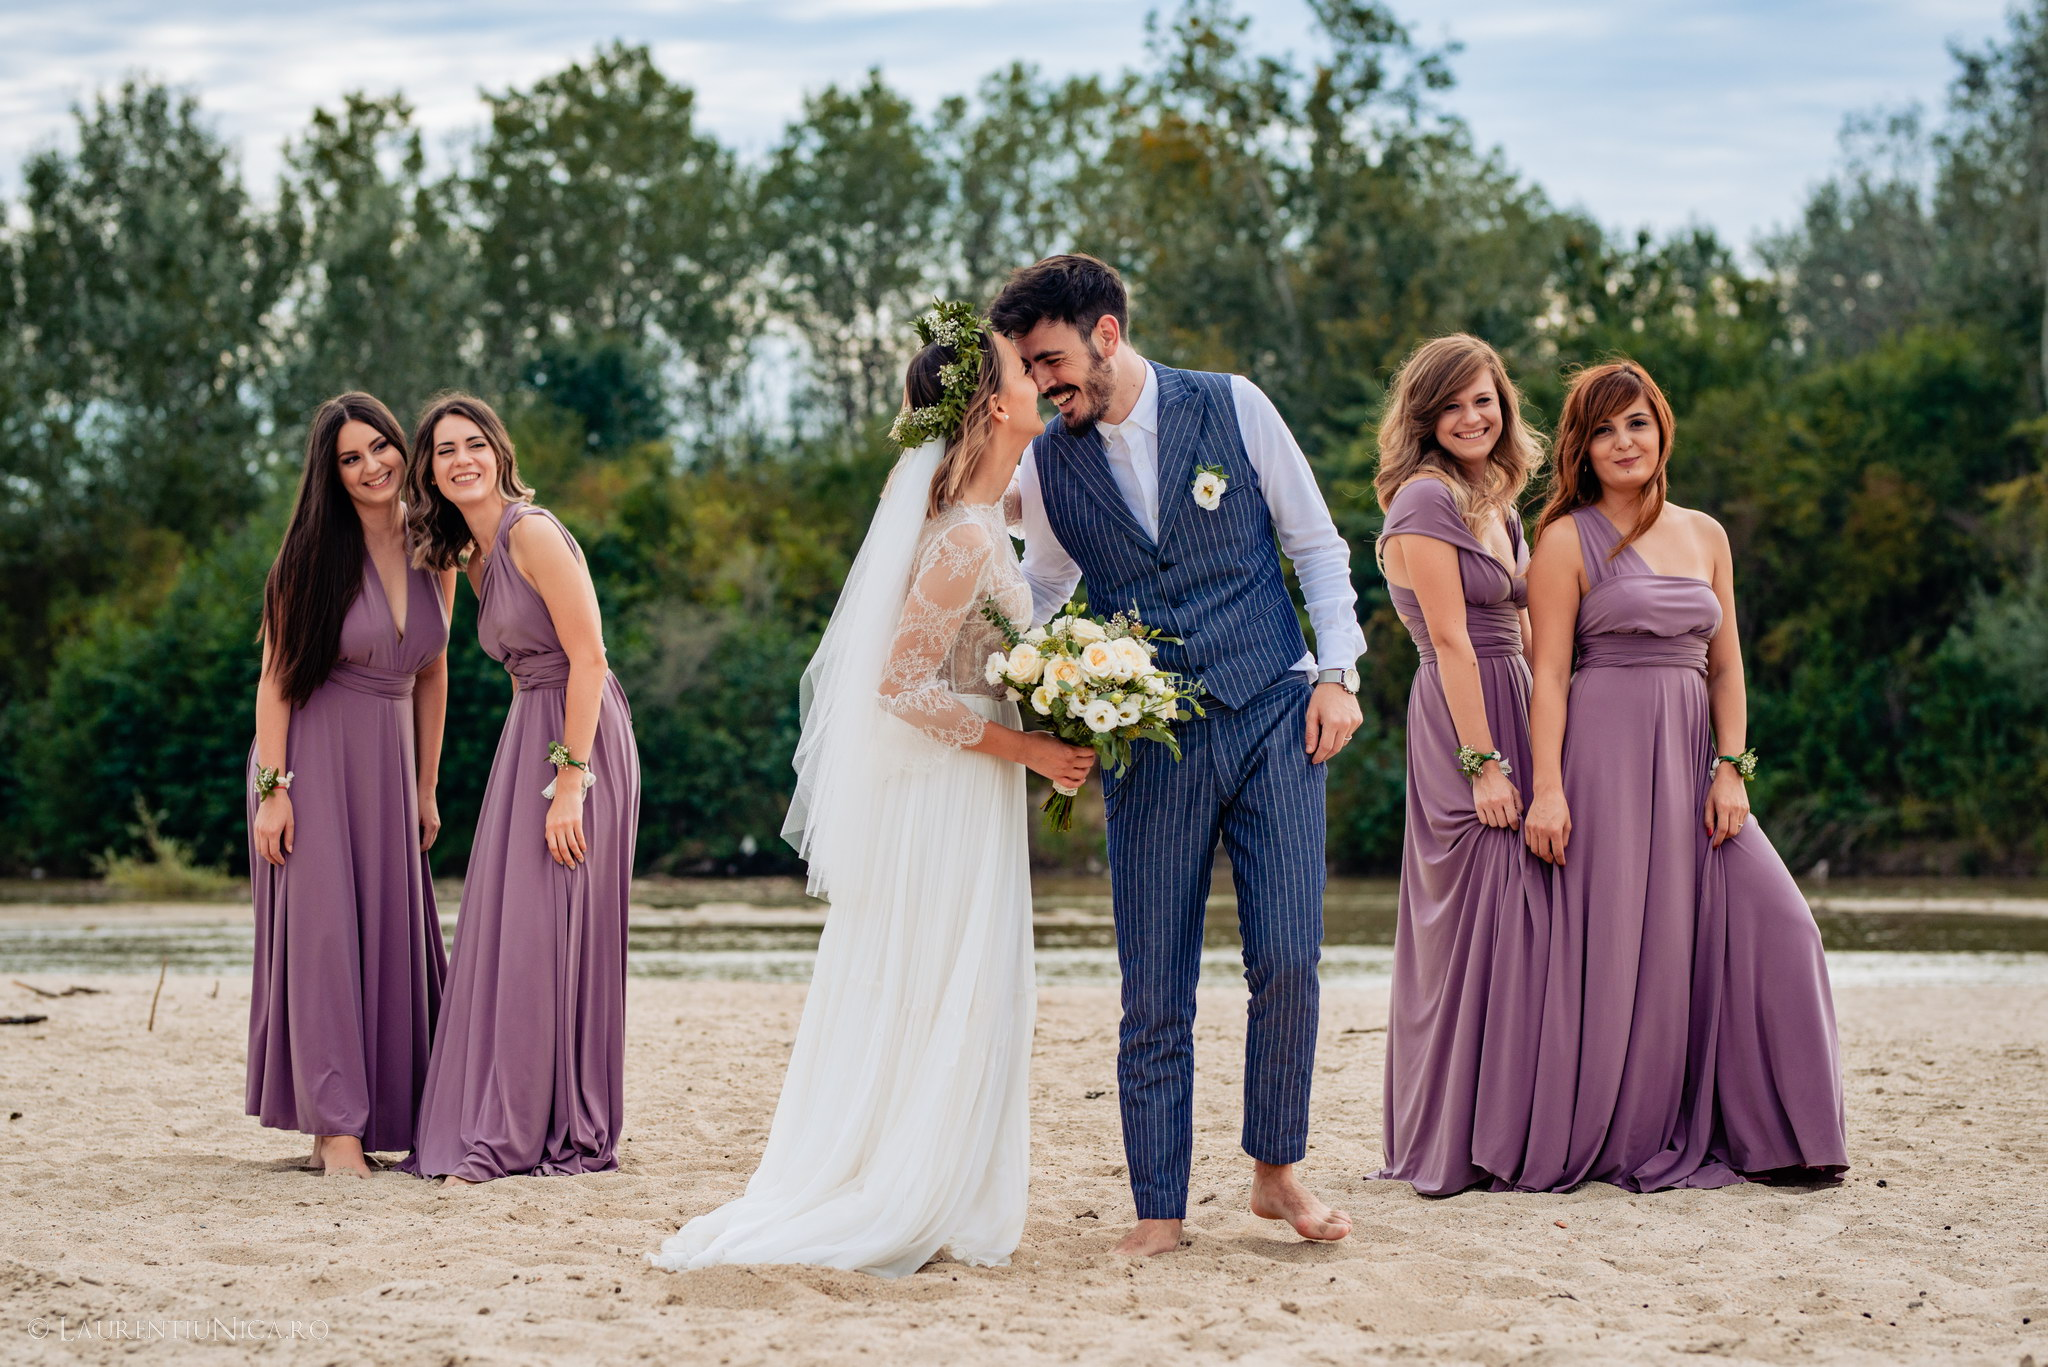 20180915 LN 0567 - Diana & Marius | Fotografii nunta | Slatina